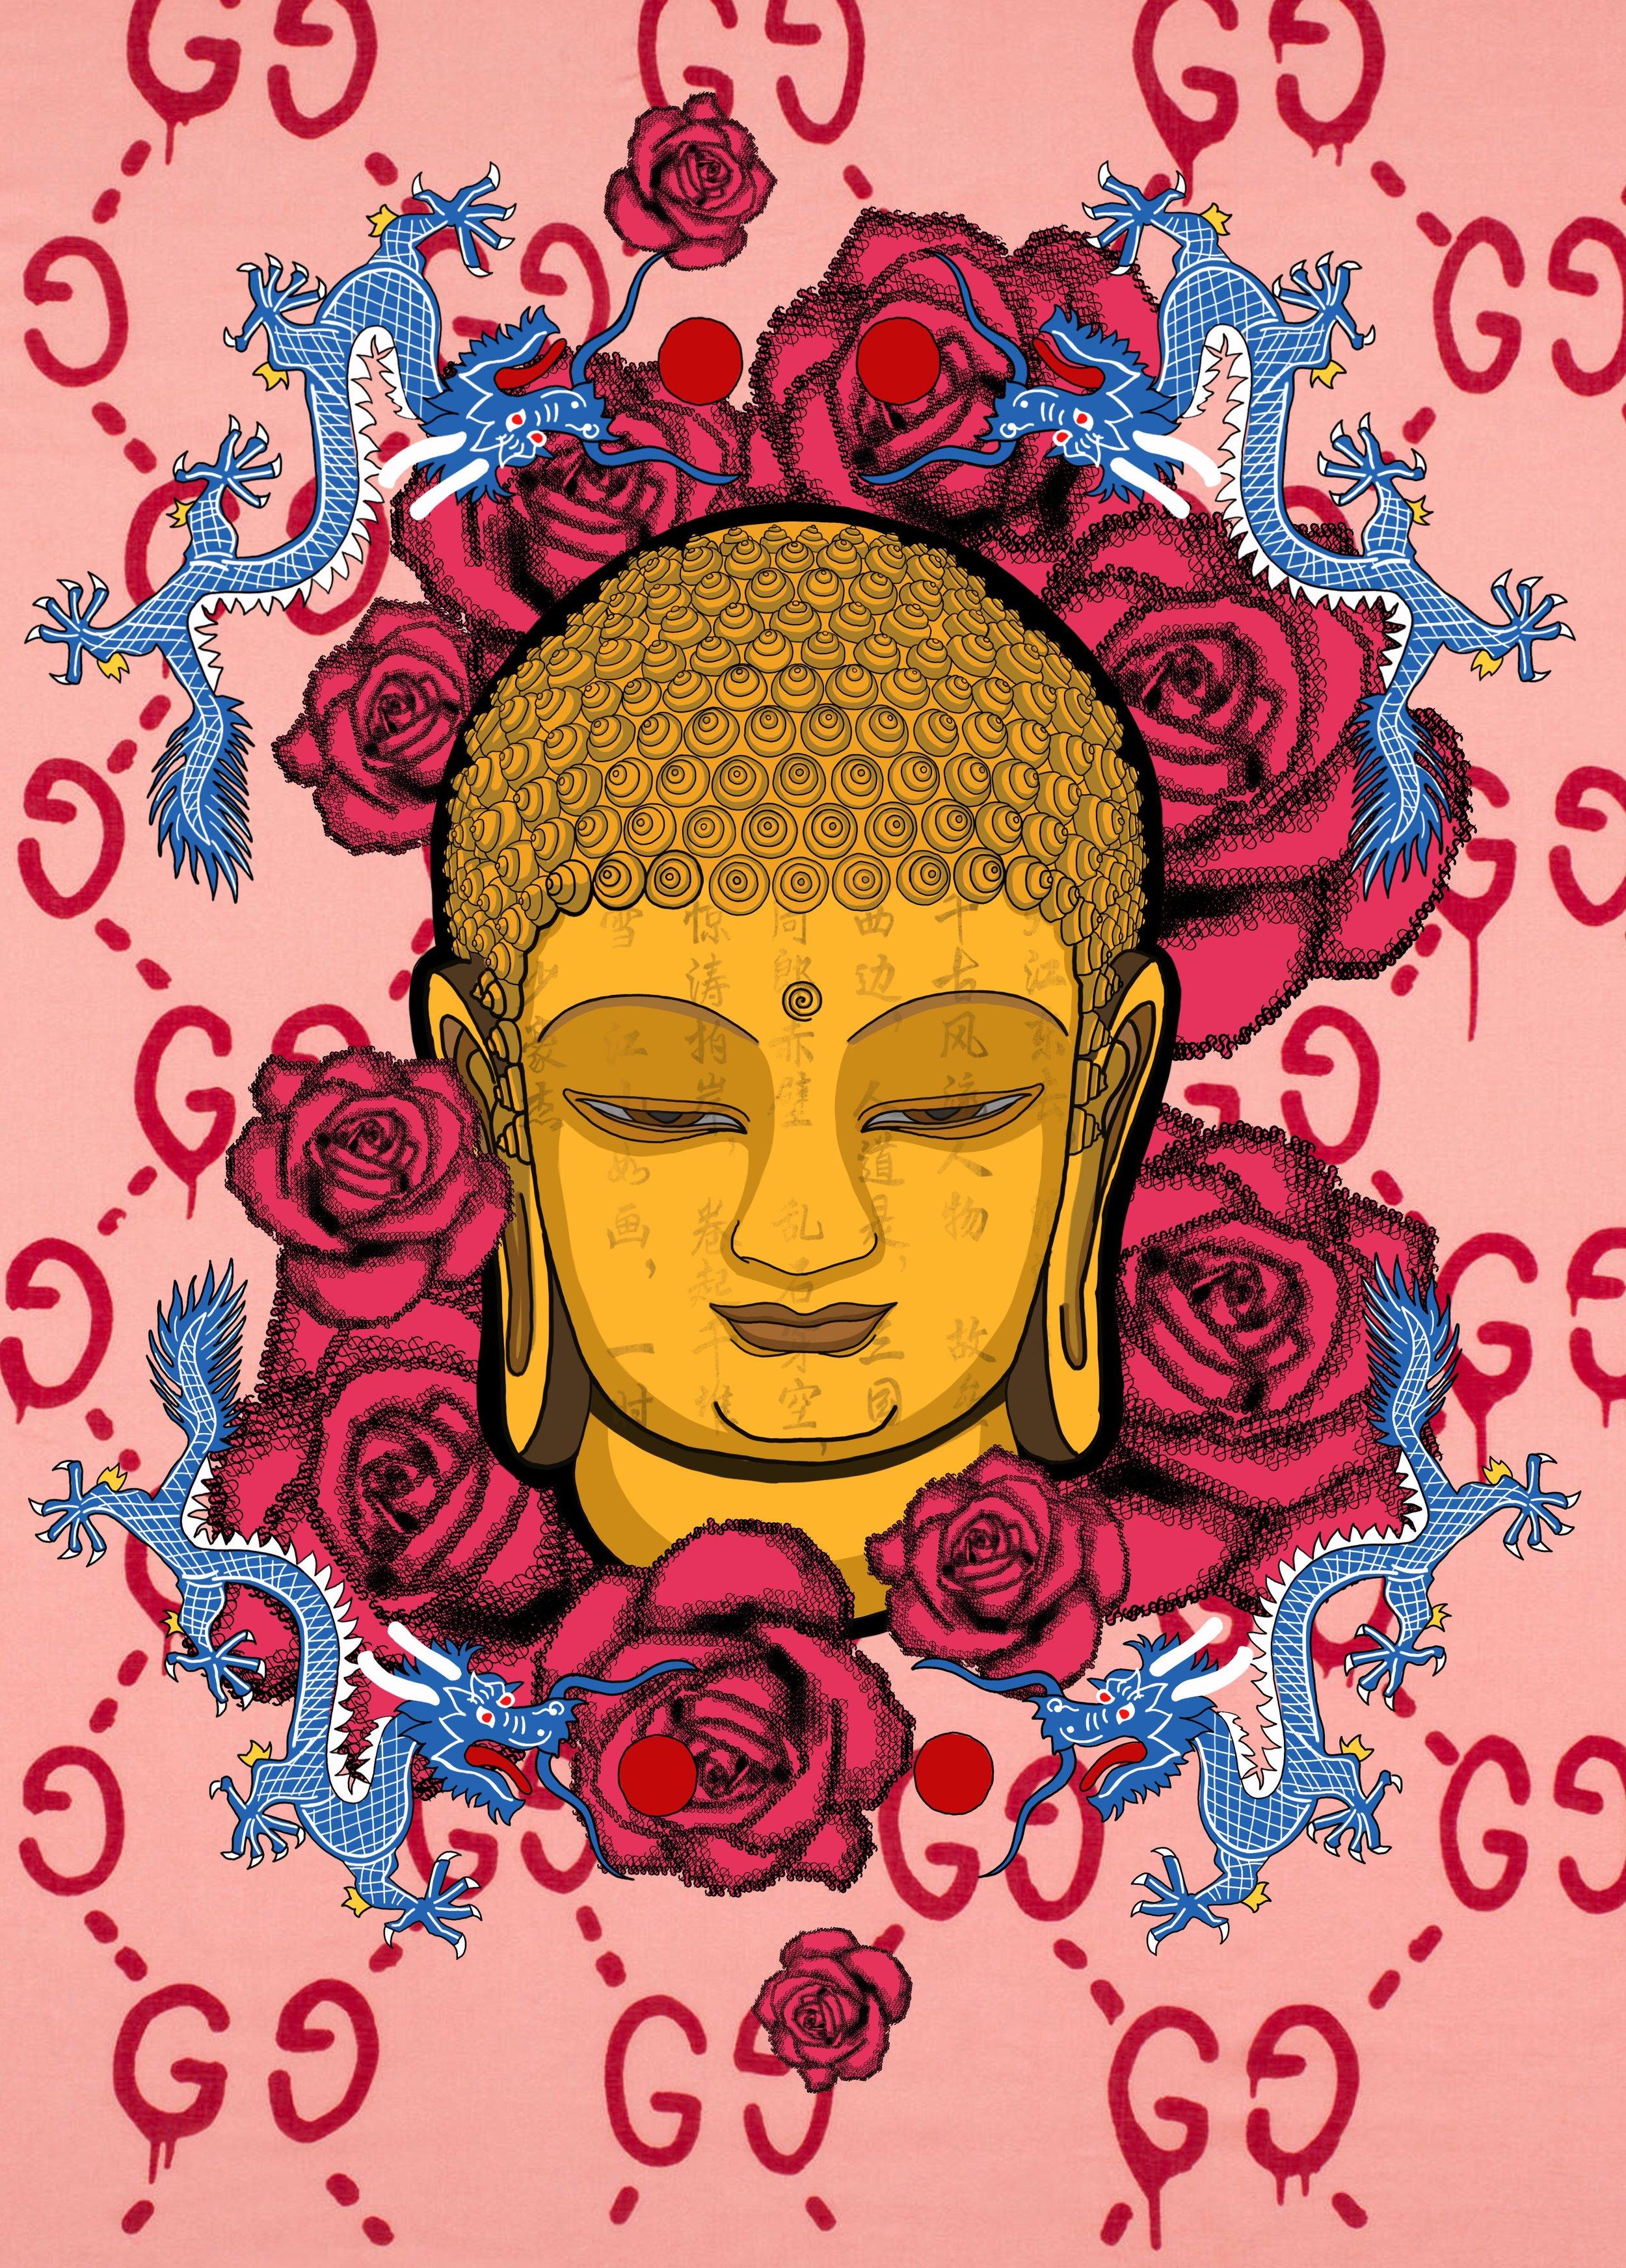 JING BUDDHA FROM THE ROSE HEAVEN (GG GUCCI PRINT)